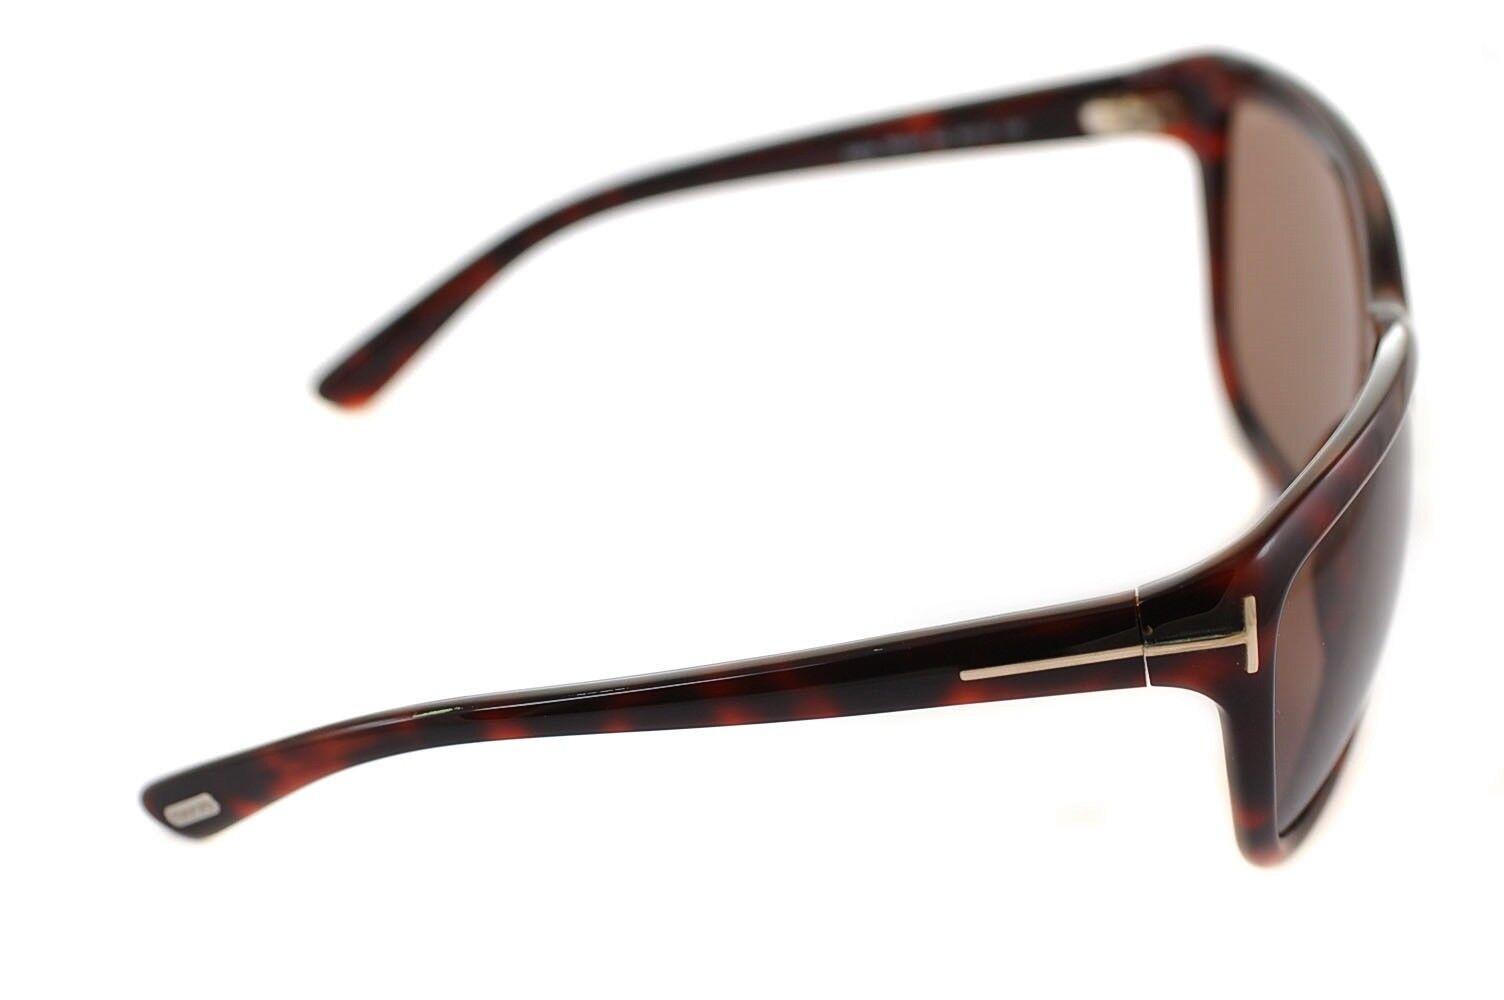 26f92736e9c44 TOM FORD DAHLIA TF127 52J Women Ladies OVERSIZED wayfare Sunglasses ...